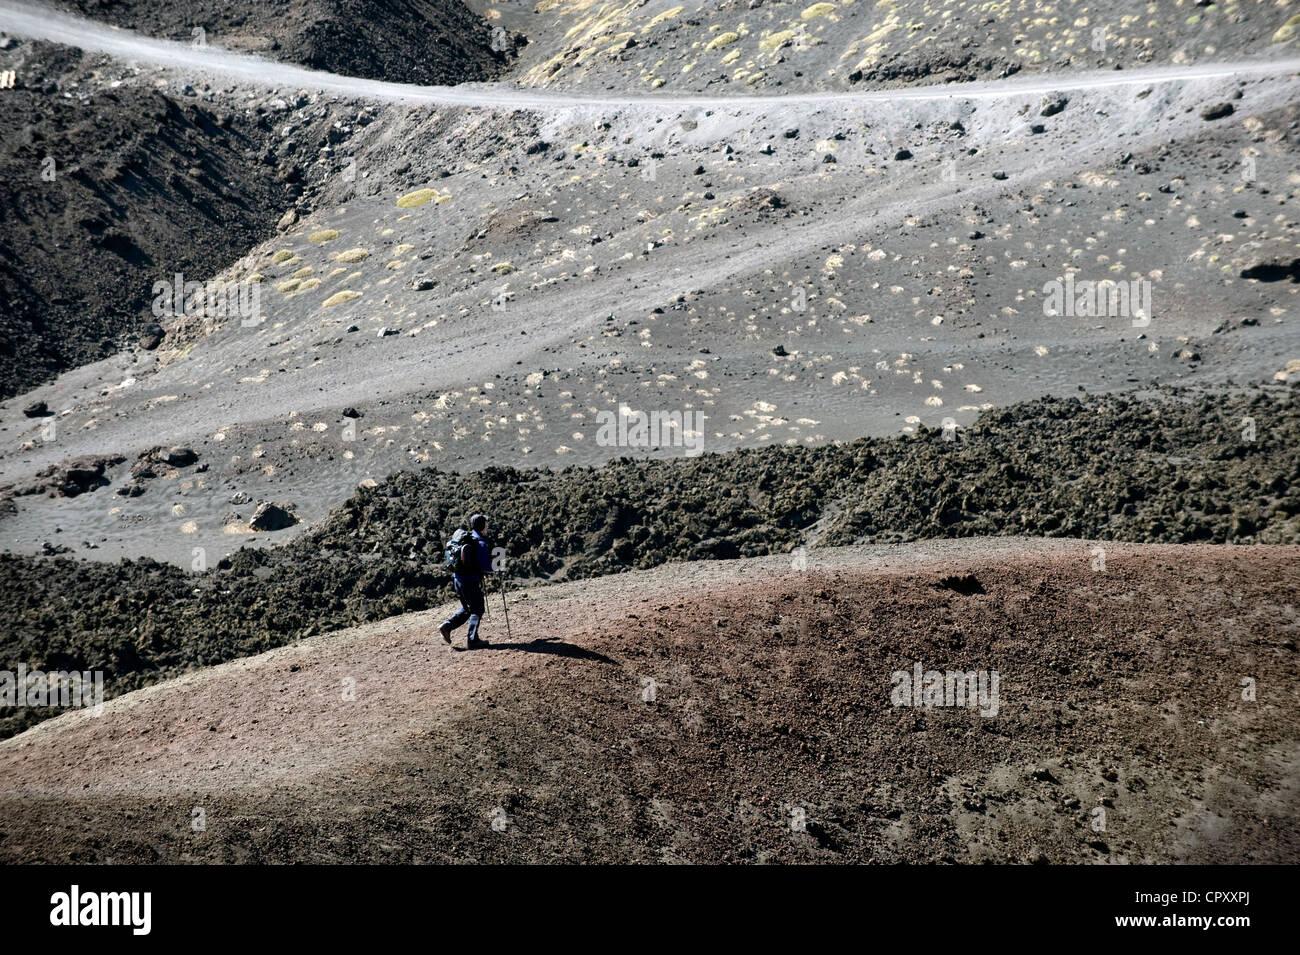 Italy, Sicily, Etna - Stock Image